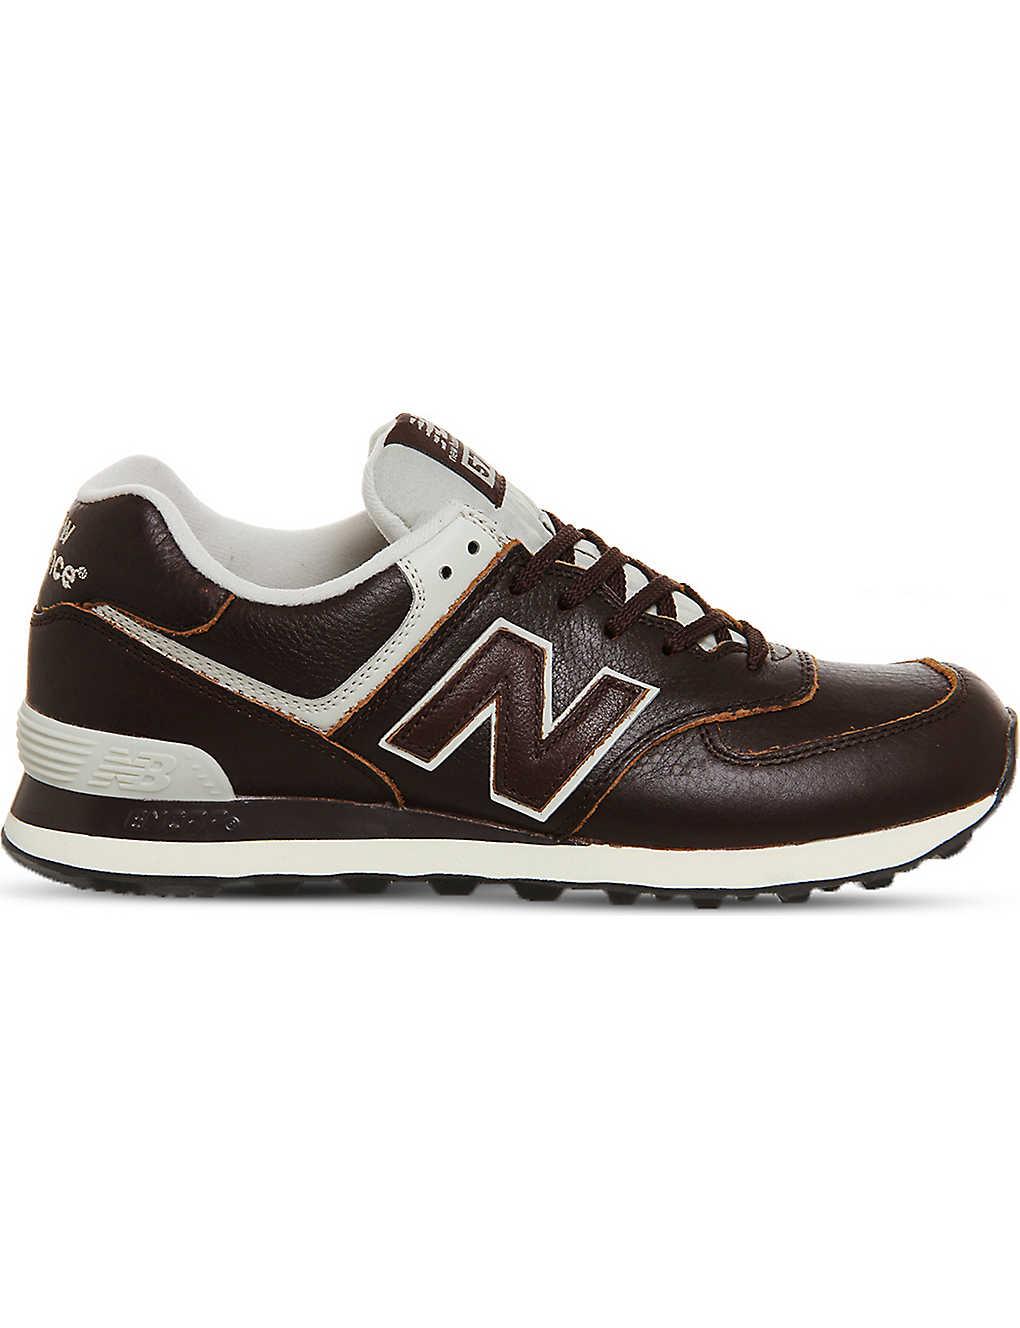 e94211e0332b6 NEW BALANCE - 574 lace-up leather trainers | Selfridges.com